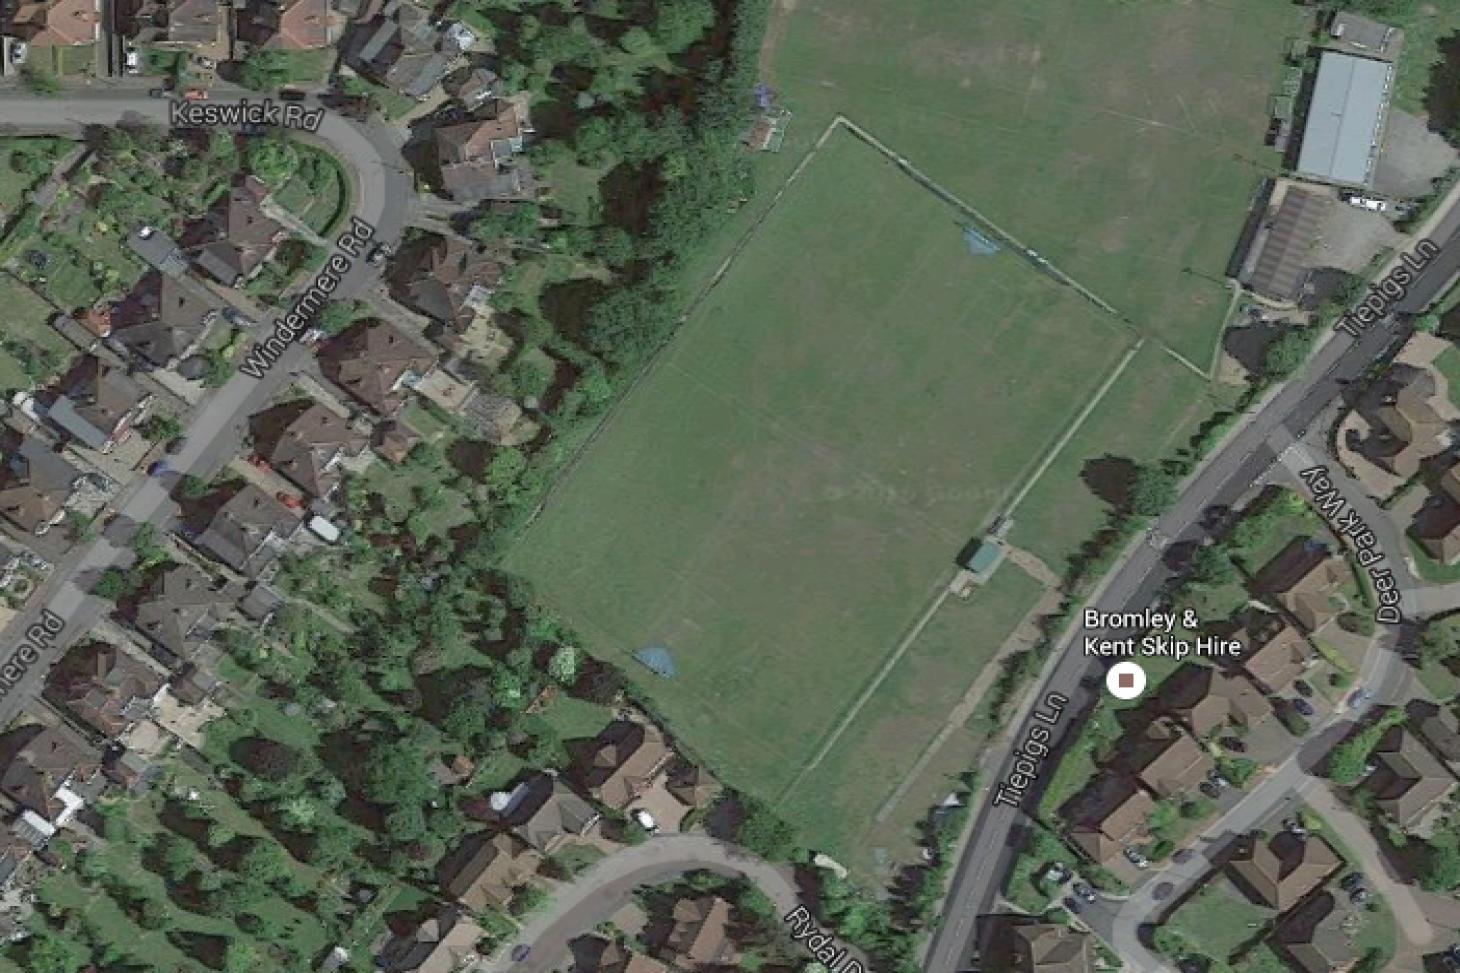 Coney Hall Football Club 11 a side | Grass football pitch